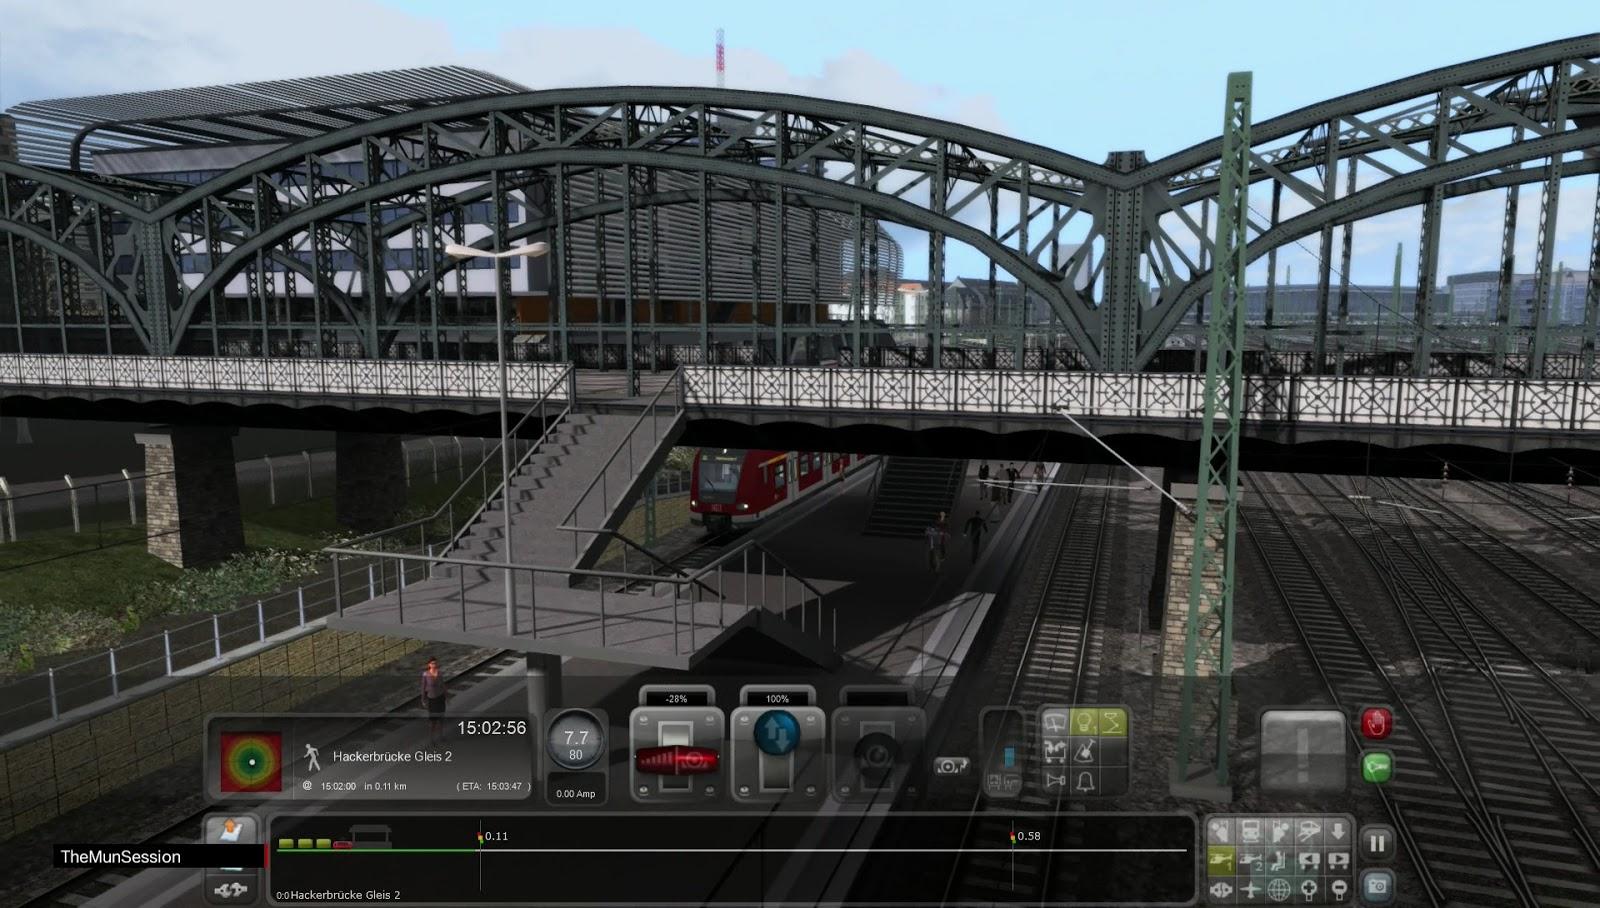 B B Augsburg themunsession motorsport gaming simulator db br423 munich to augsburg db 423 s3